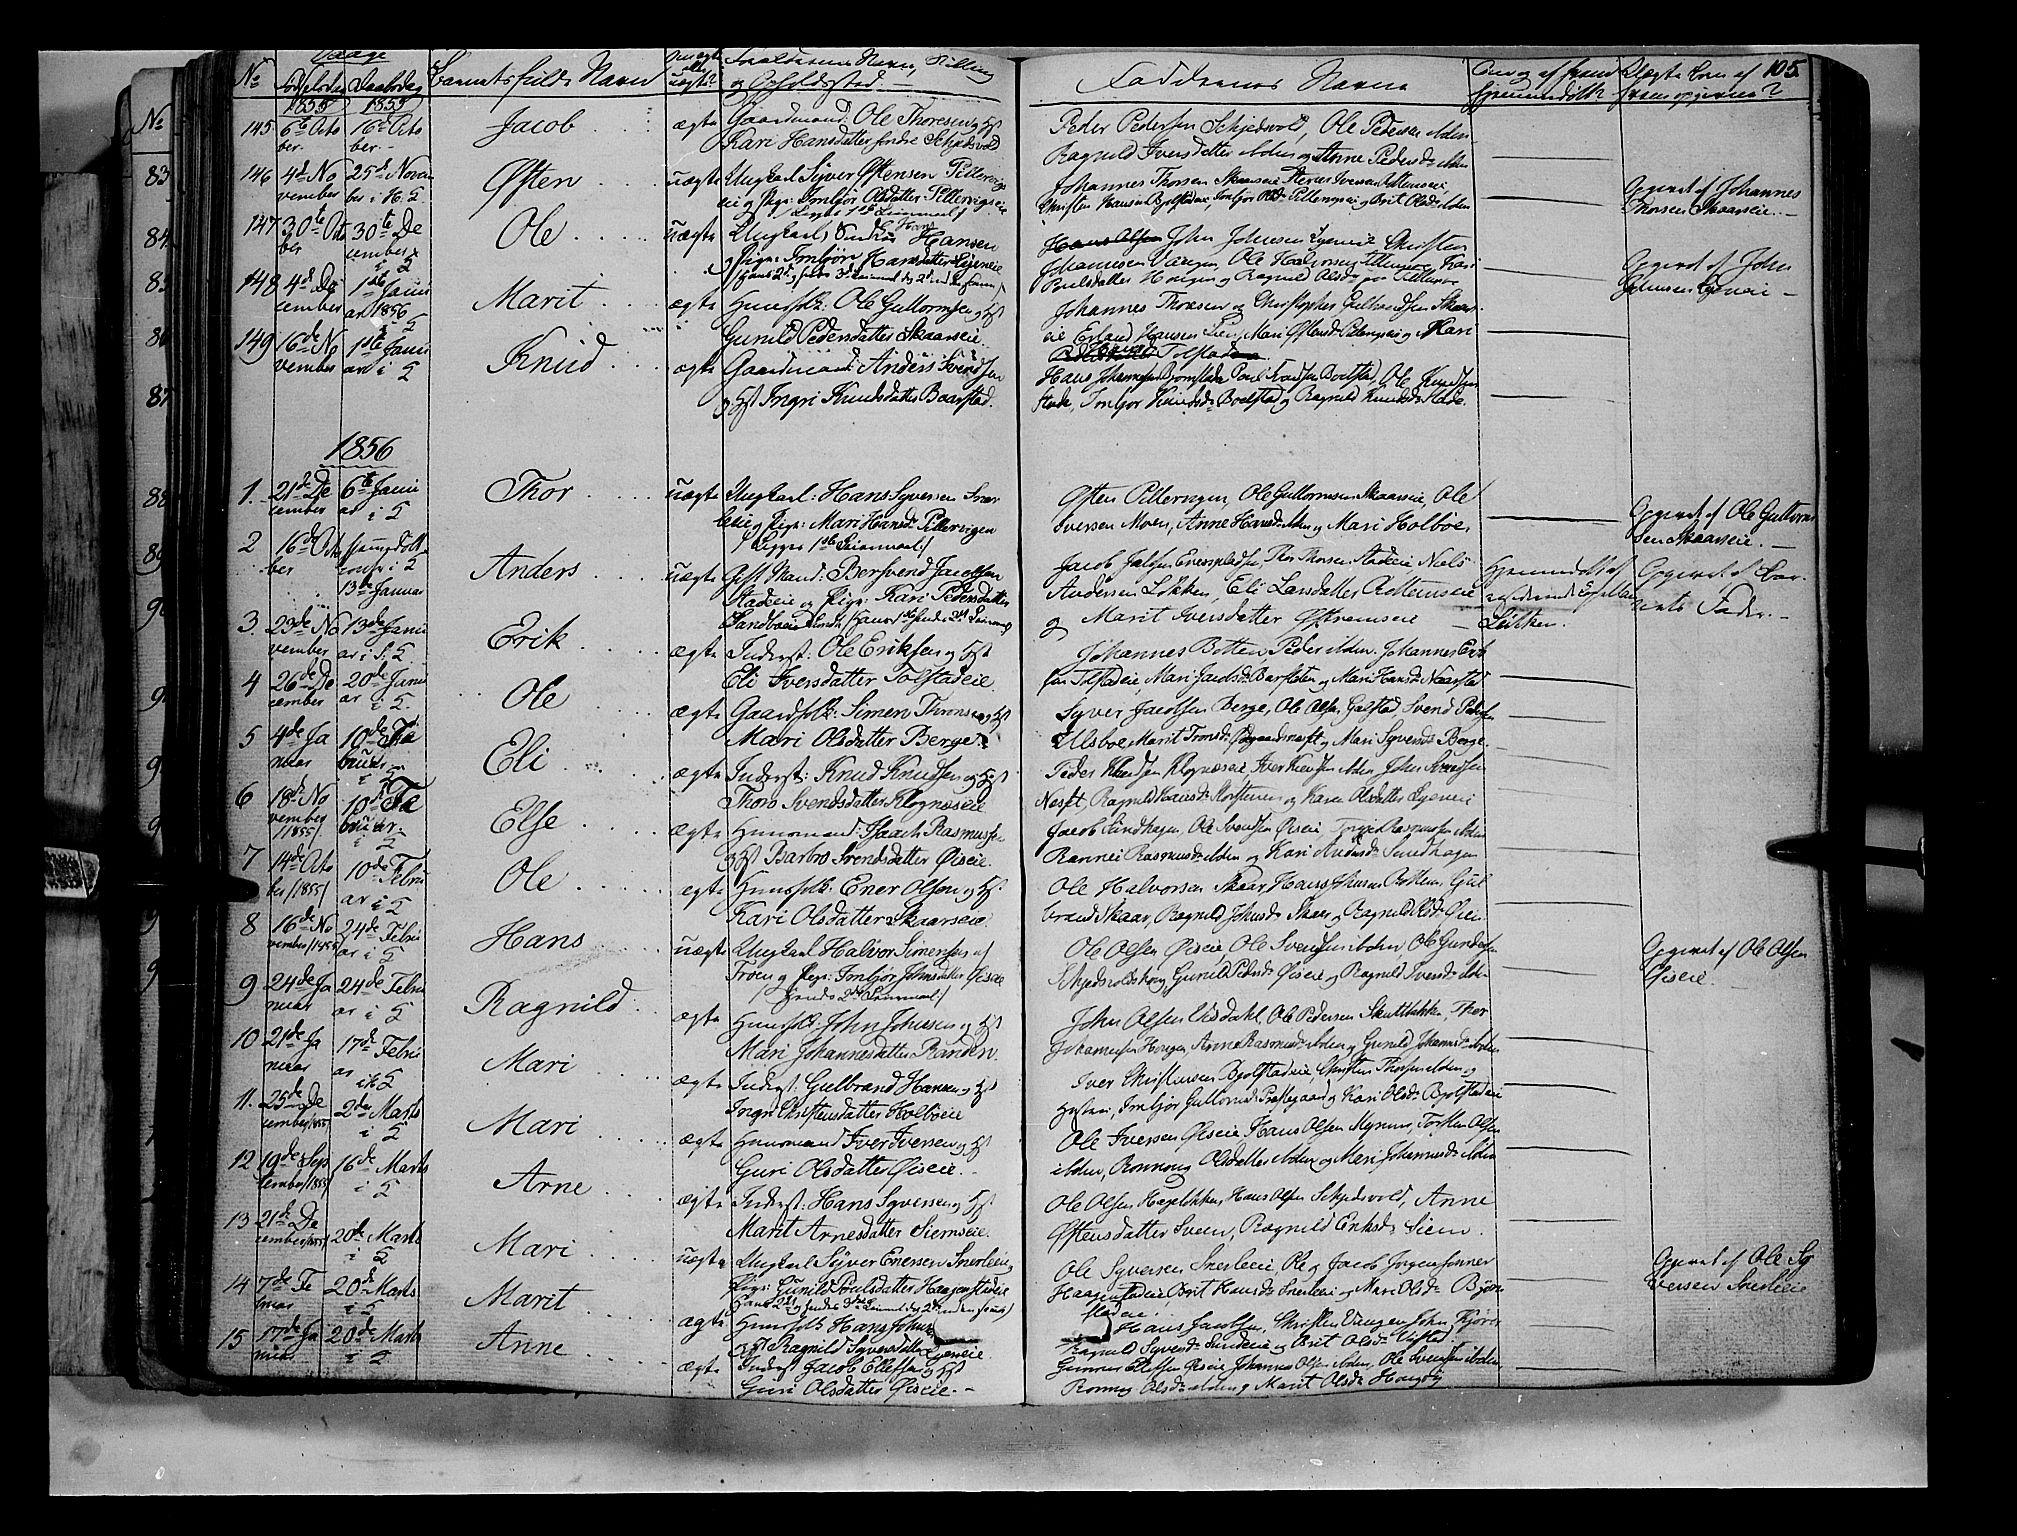 SAH, Vågå prestekontor, Ministerialbok nr. 5 /1, 1842-1856, s. 105